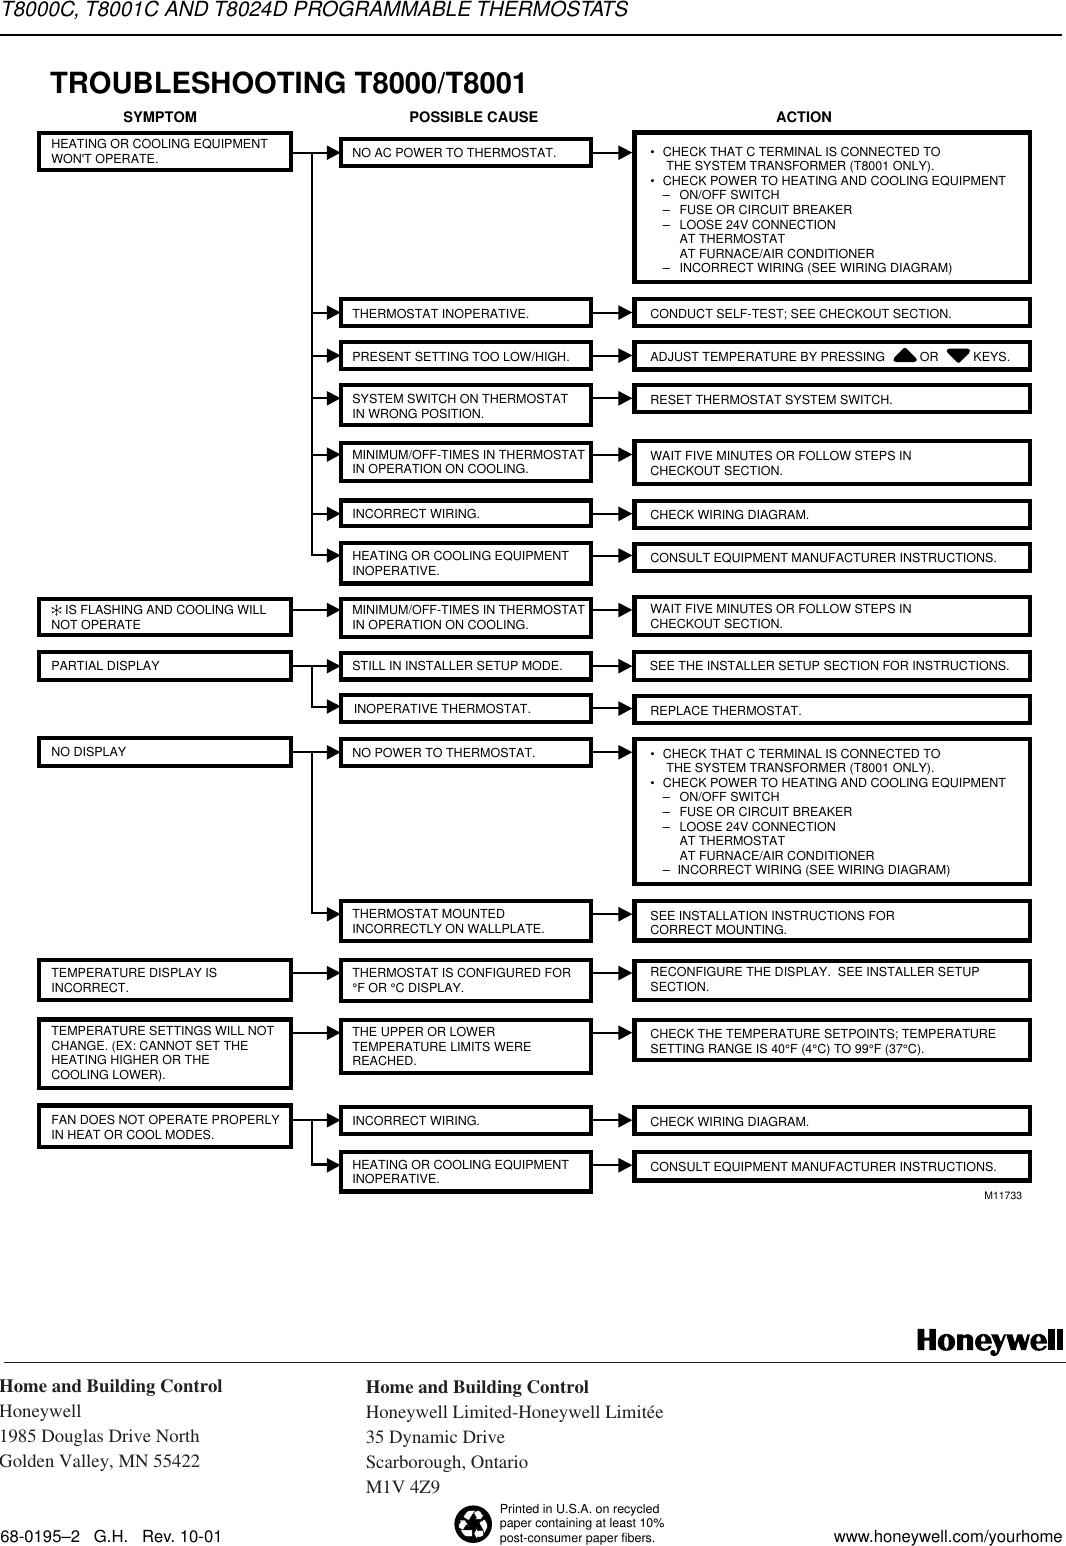 Honeywell T D Users Manual 68